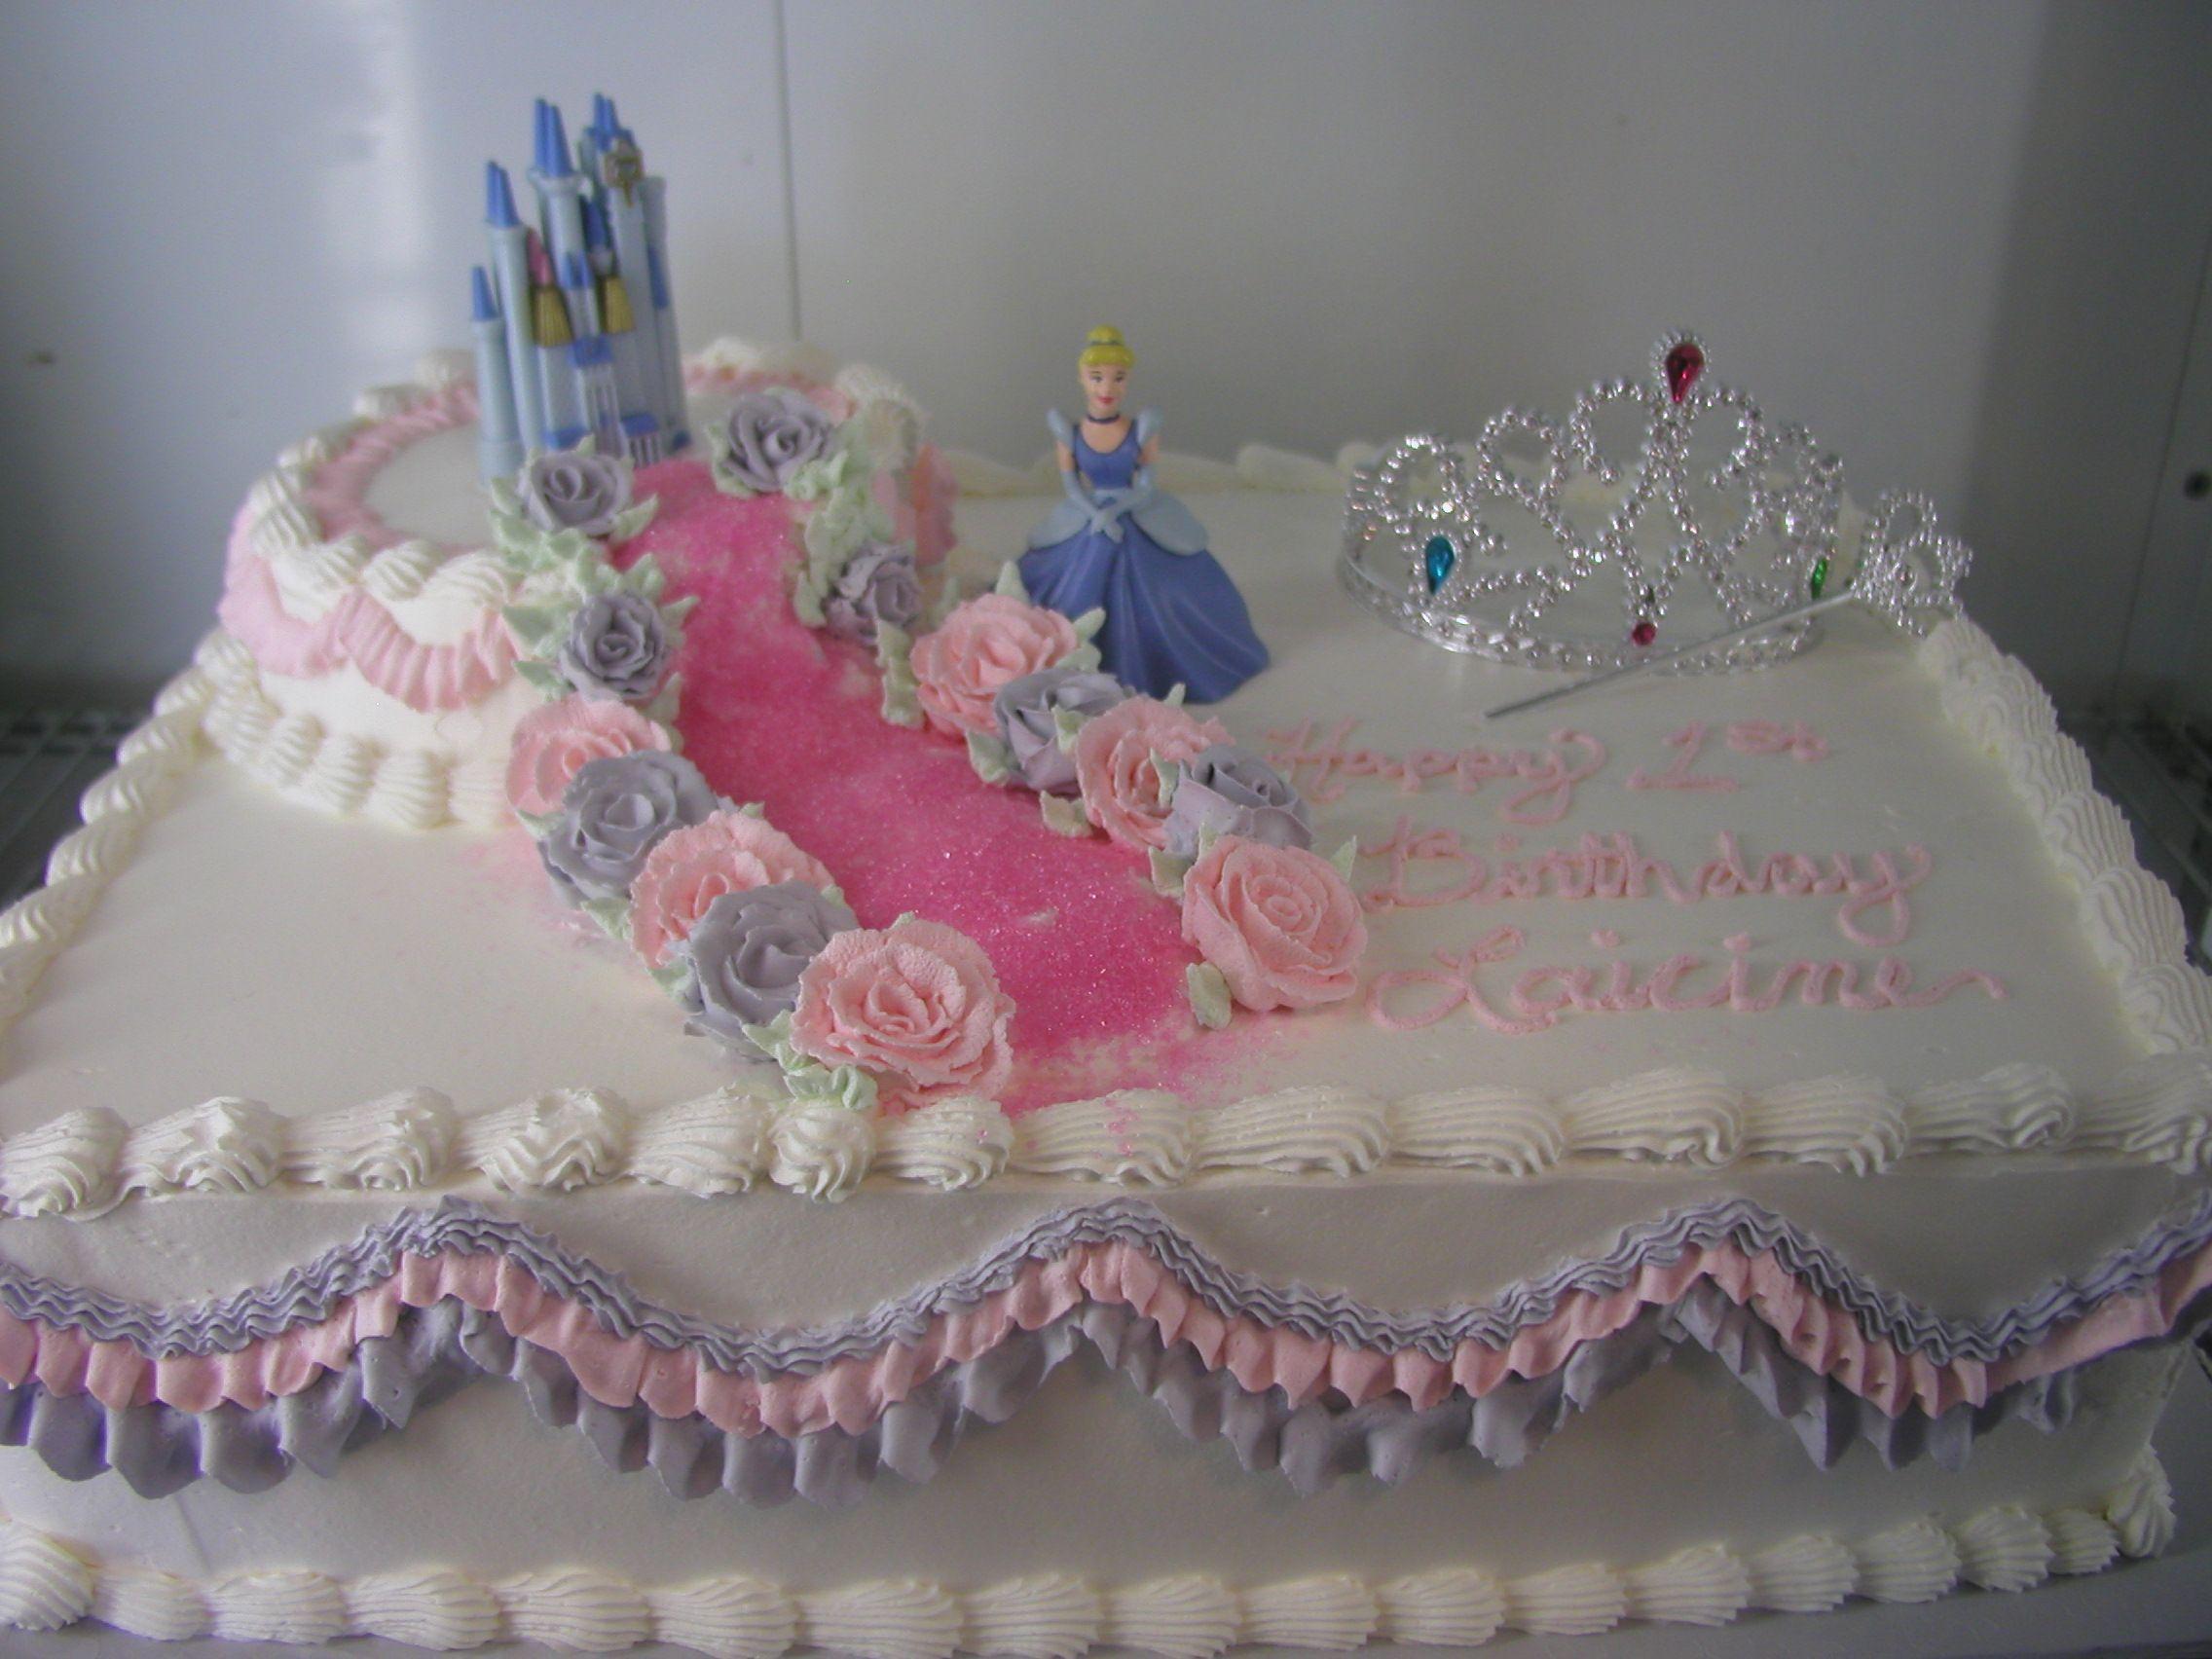 sheet 01 Cinderella cake done by delriocakesbiz in Temecula ca